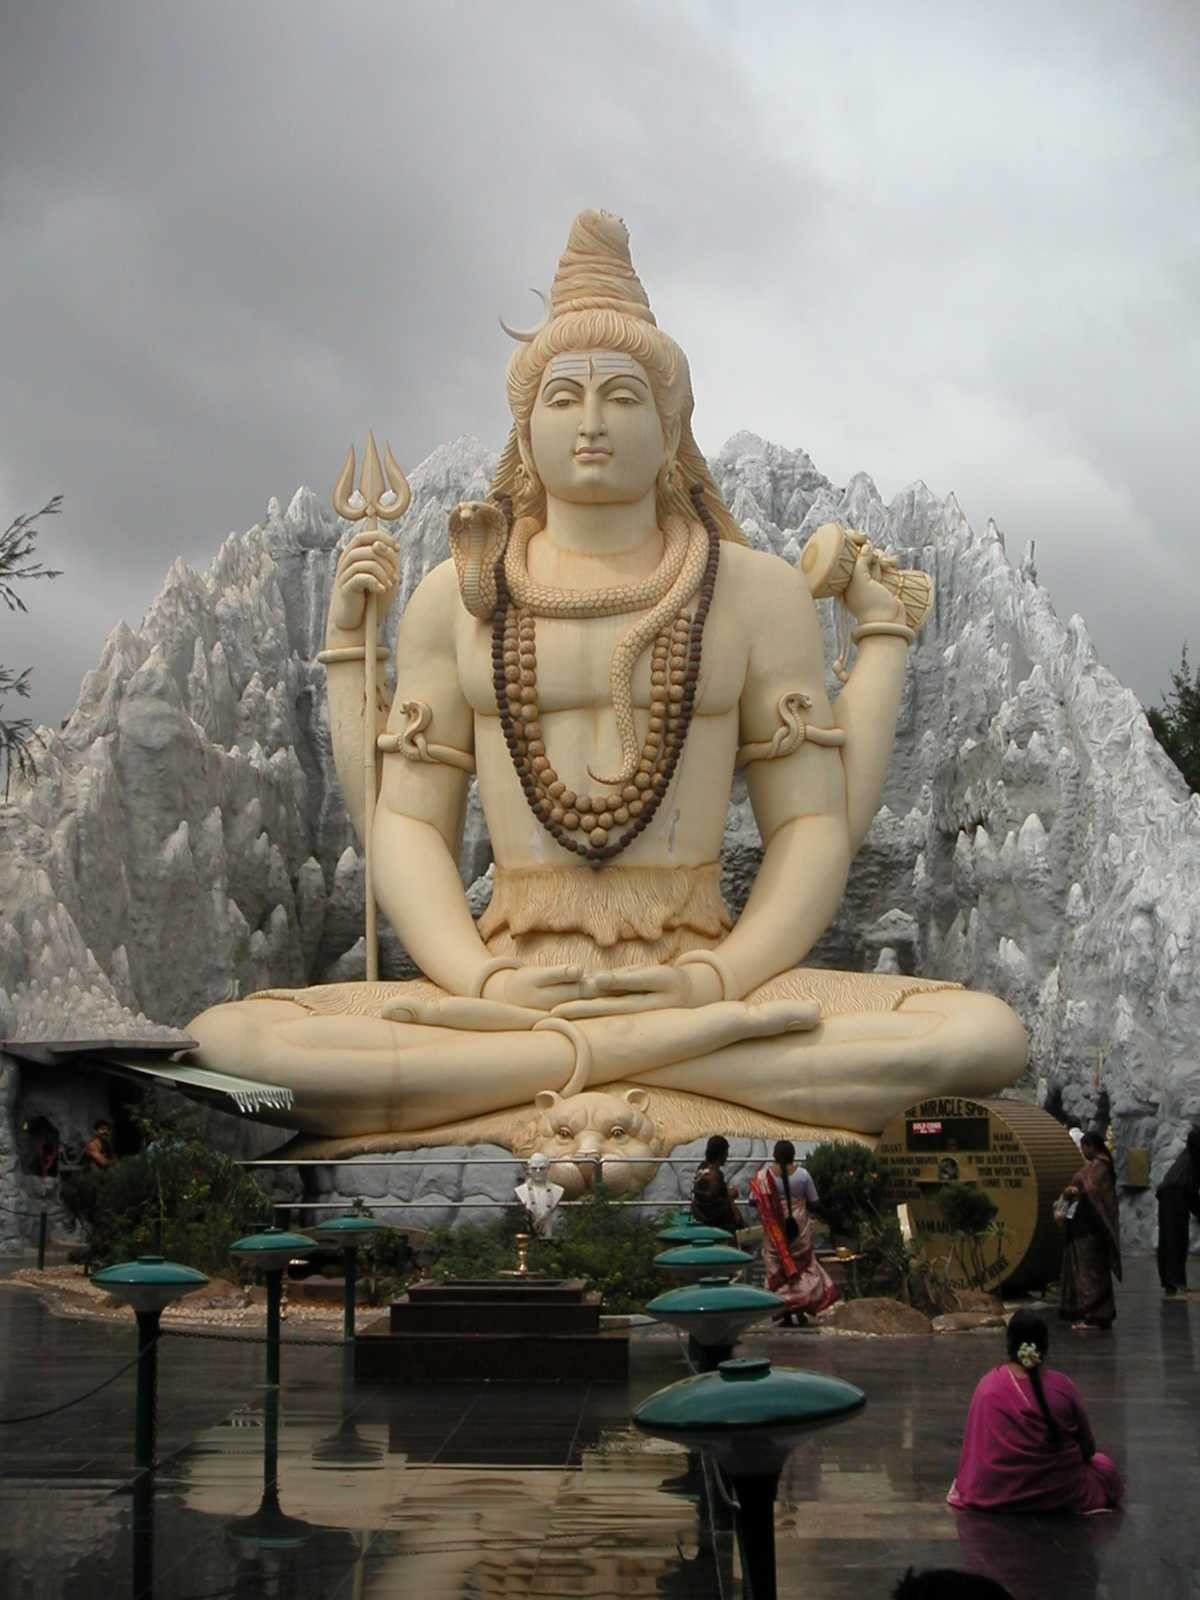 PunjabKesari, महाशिवरात्रि 2020, Mahashivratri 2020, Mahashivratri, Mahashivratri 2020 puja vidhi, Mahashivratri mantra, Mahashivratri Importance, Mahashivratri puja date 2020, Shivlinga, dharm, hindu religion, hindu shastra